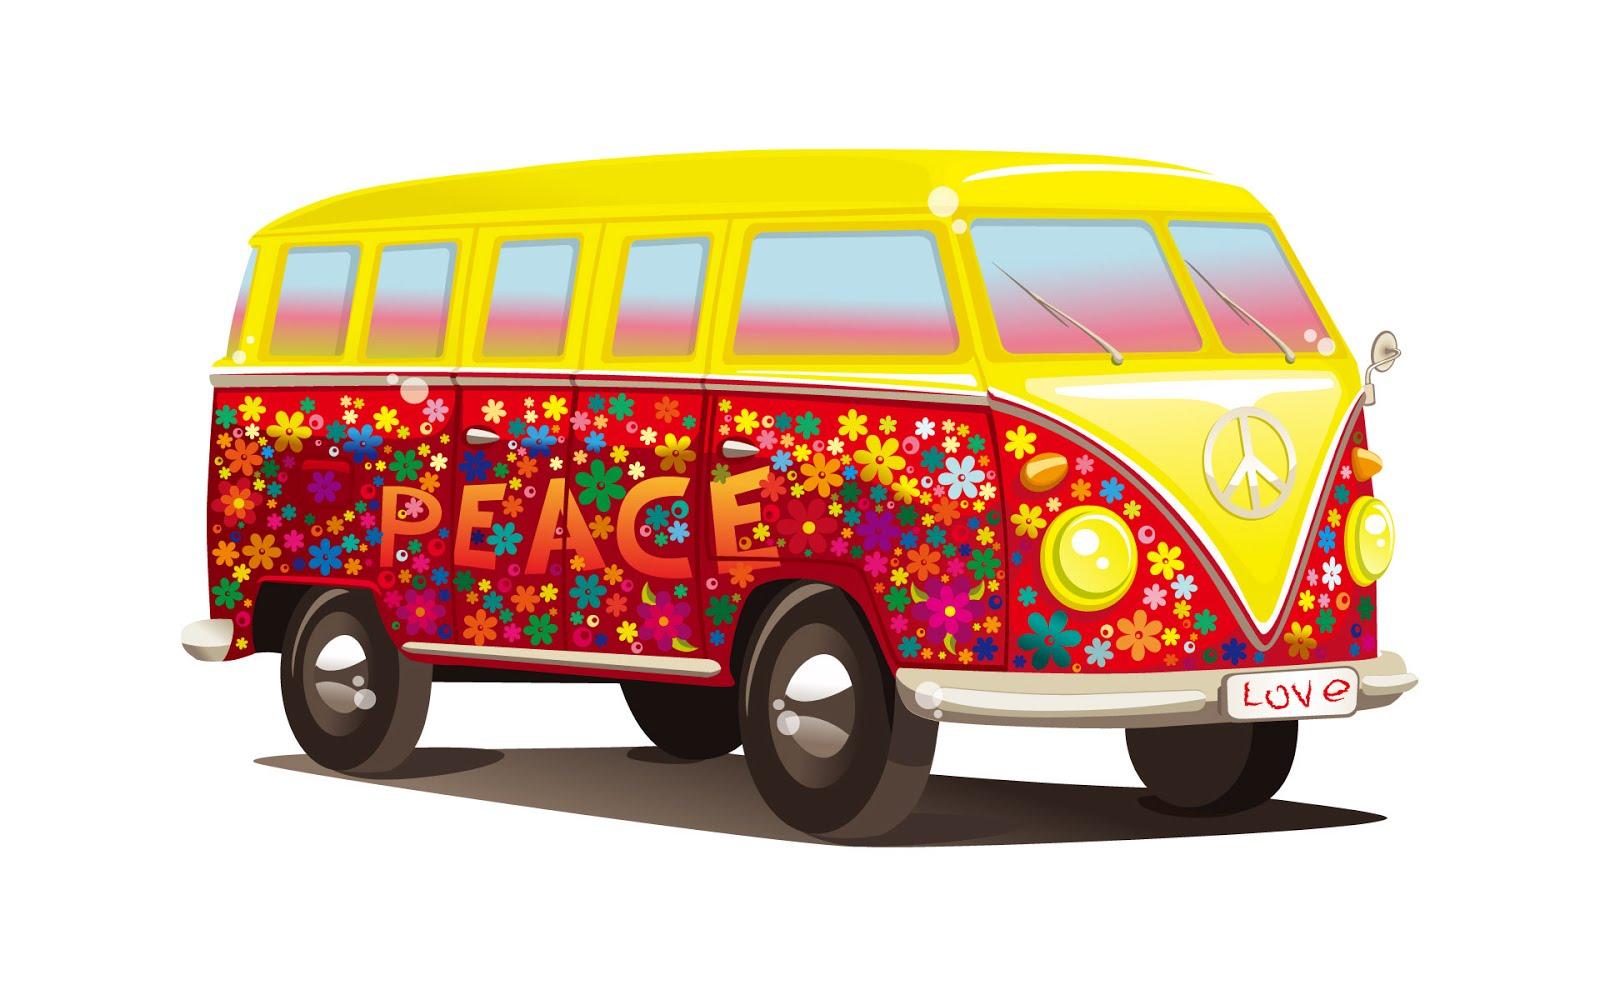 Cartoon Bus Wallpaper Cartoon Images 1600x1000